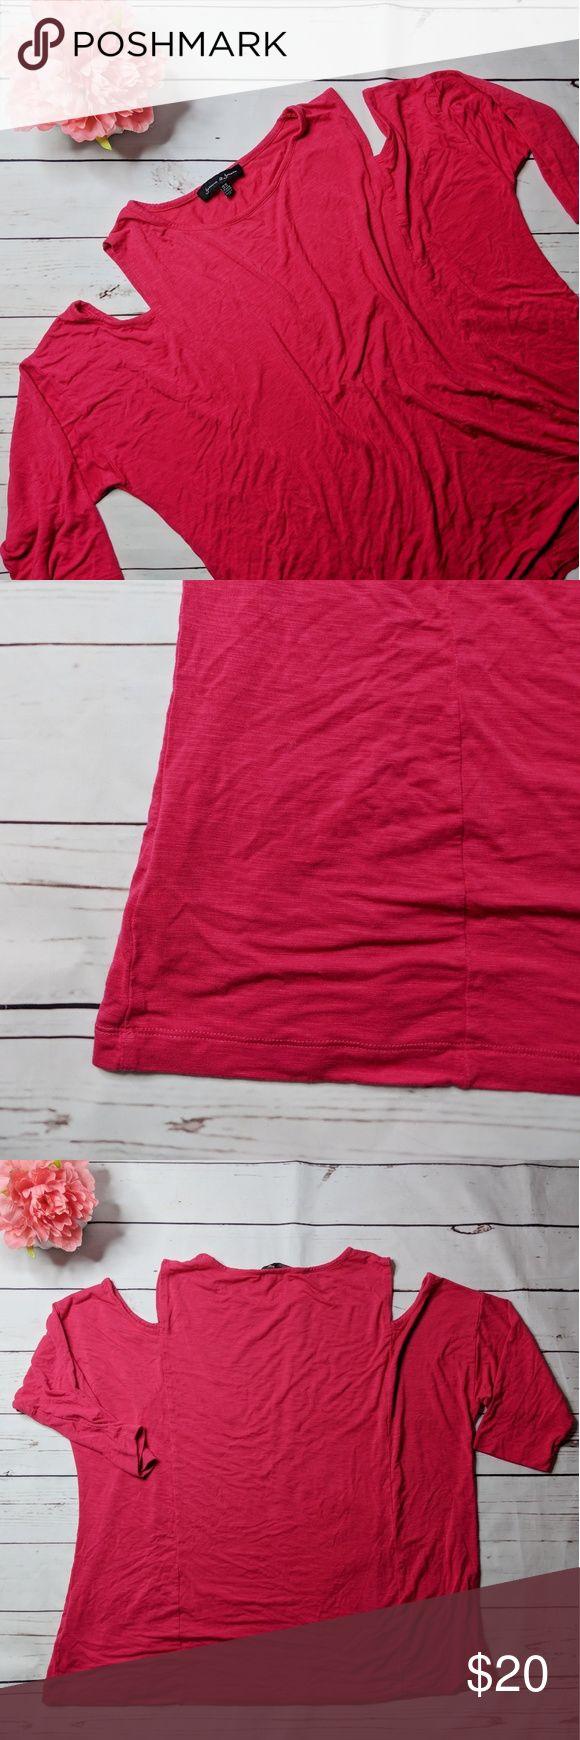 Jasmine & Juliana • Cold shoulder 3/4 sleeve tee Jasmine & Juliana pink cold shoulder 3/4-sleeve t-shirt. No stains, tears or holes. Excellent condition. Like new.   Measurements: Flat bust: 27 in Length: 27 in jasmine & juliana Tops Tees - Long Sleeve